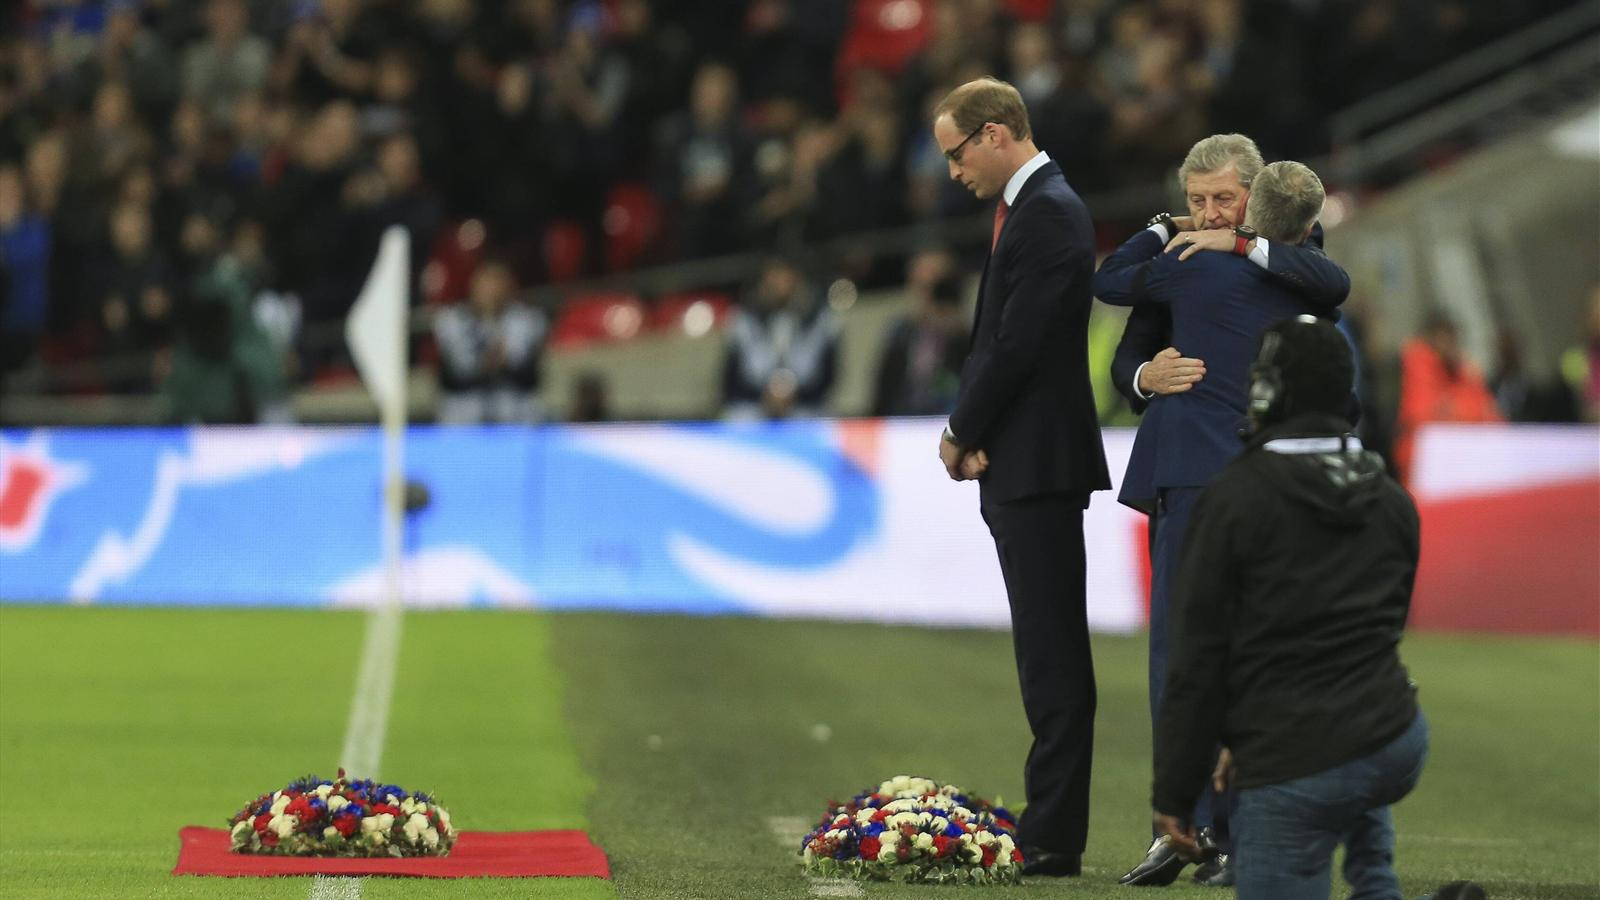 Prince Harry, Roy Hodgson, Didier Deschamps, England, France, Wembley